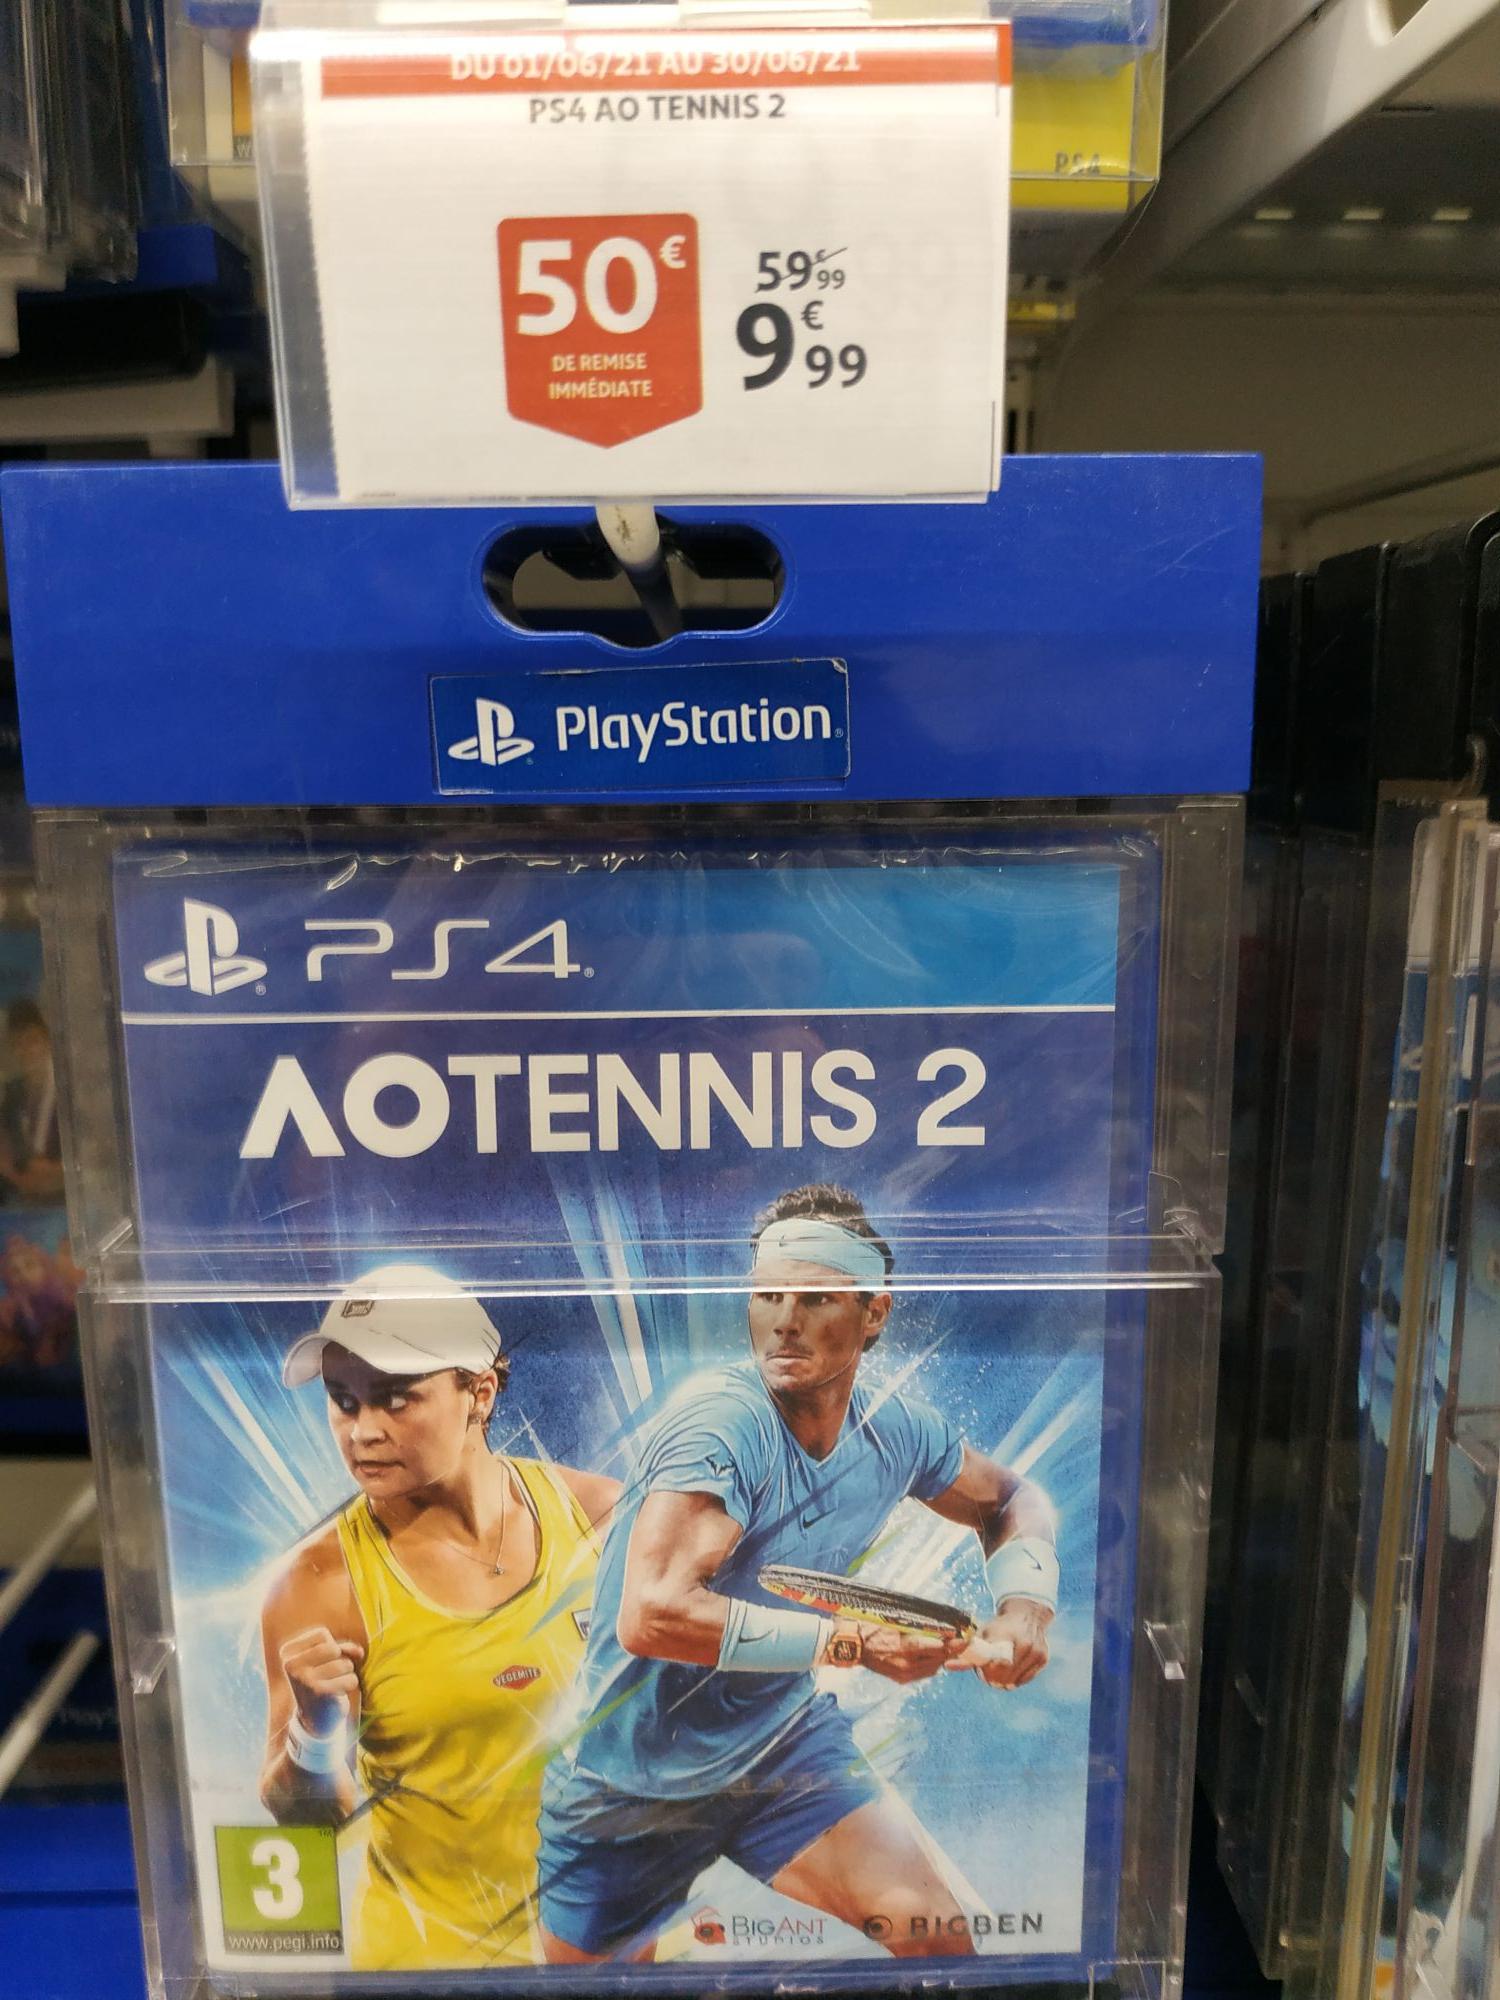 Jeu Ao Tennis 2 sur PS4 - Auchan Noyelles godault (62)